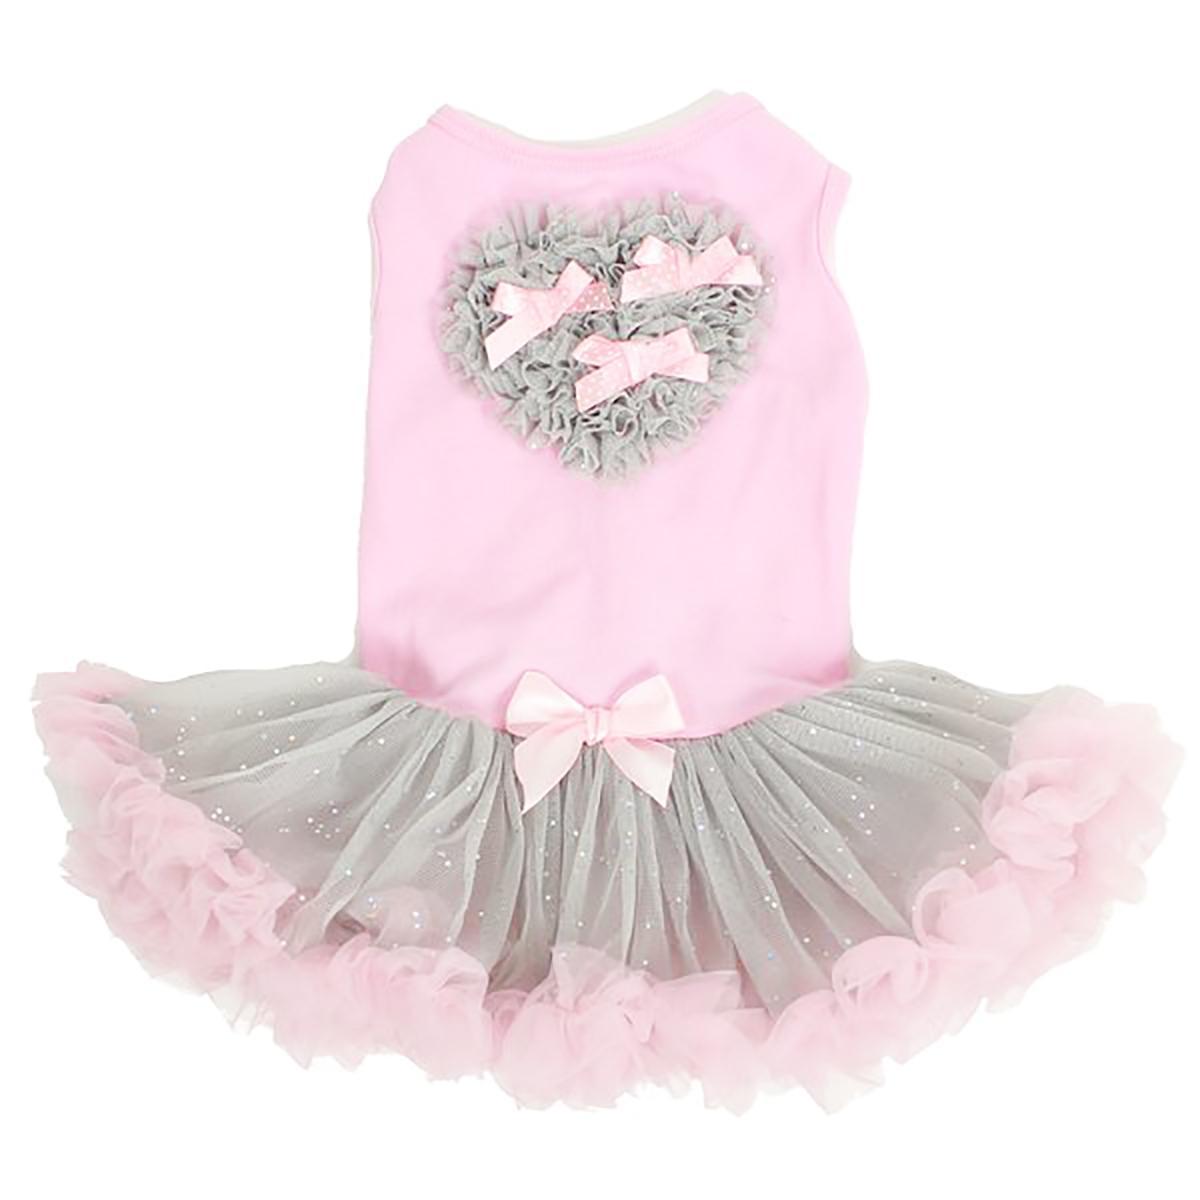 Pink and Gray Heart Pet Dress by Pawpatu